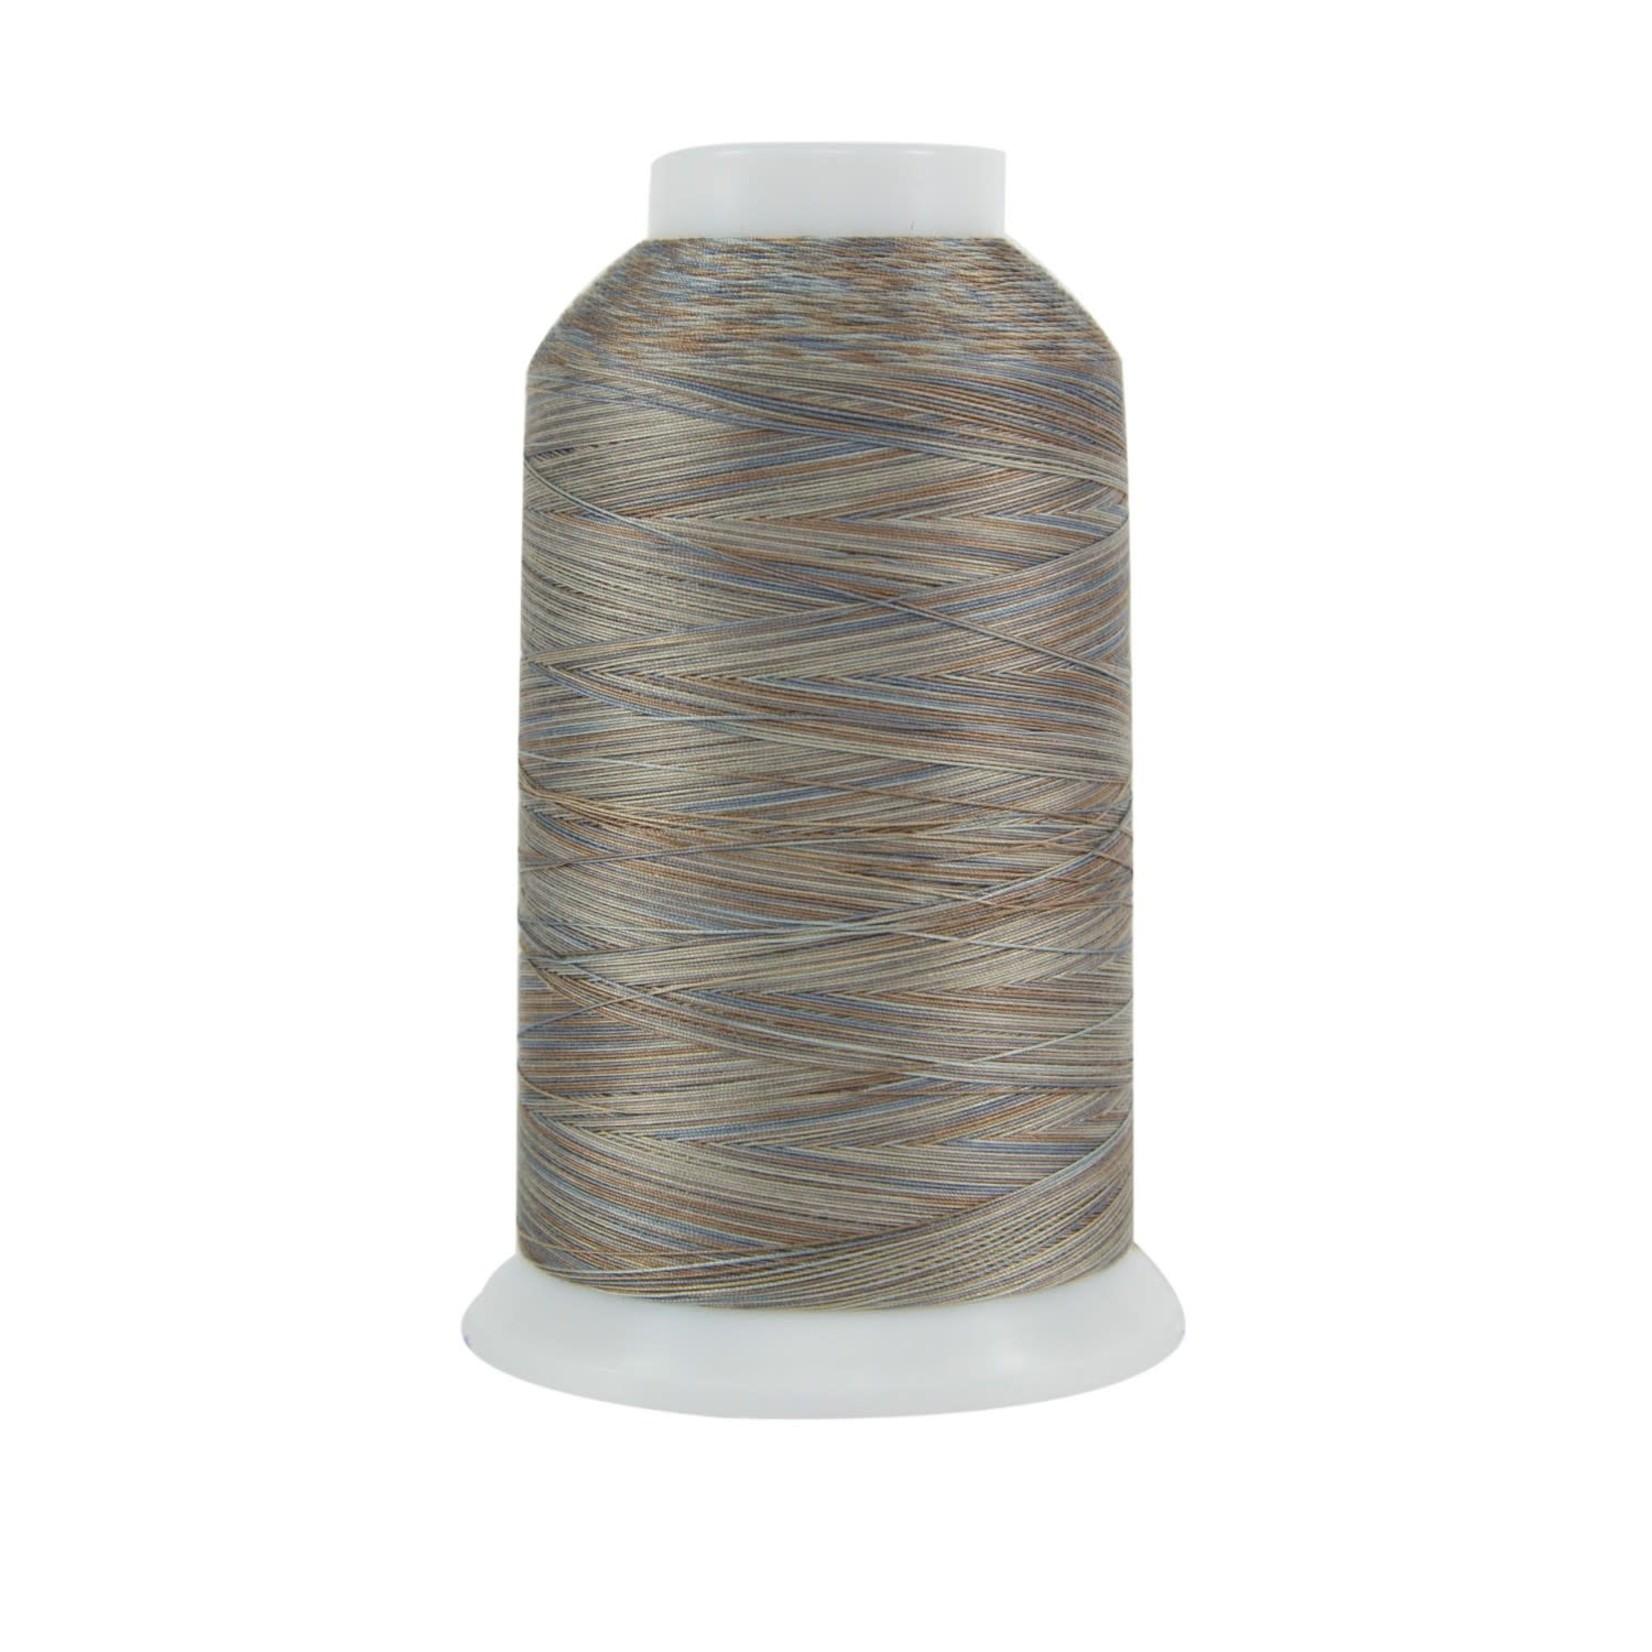 Superior Threads King Tut - #40 - 1828 m - 0980 Riverbank